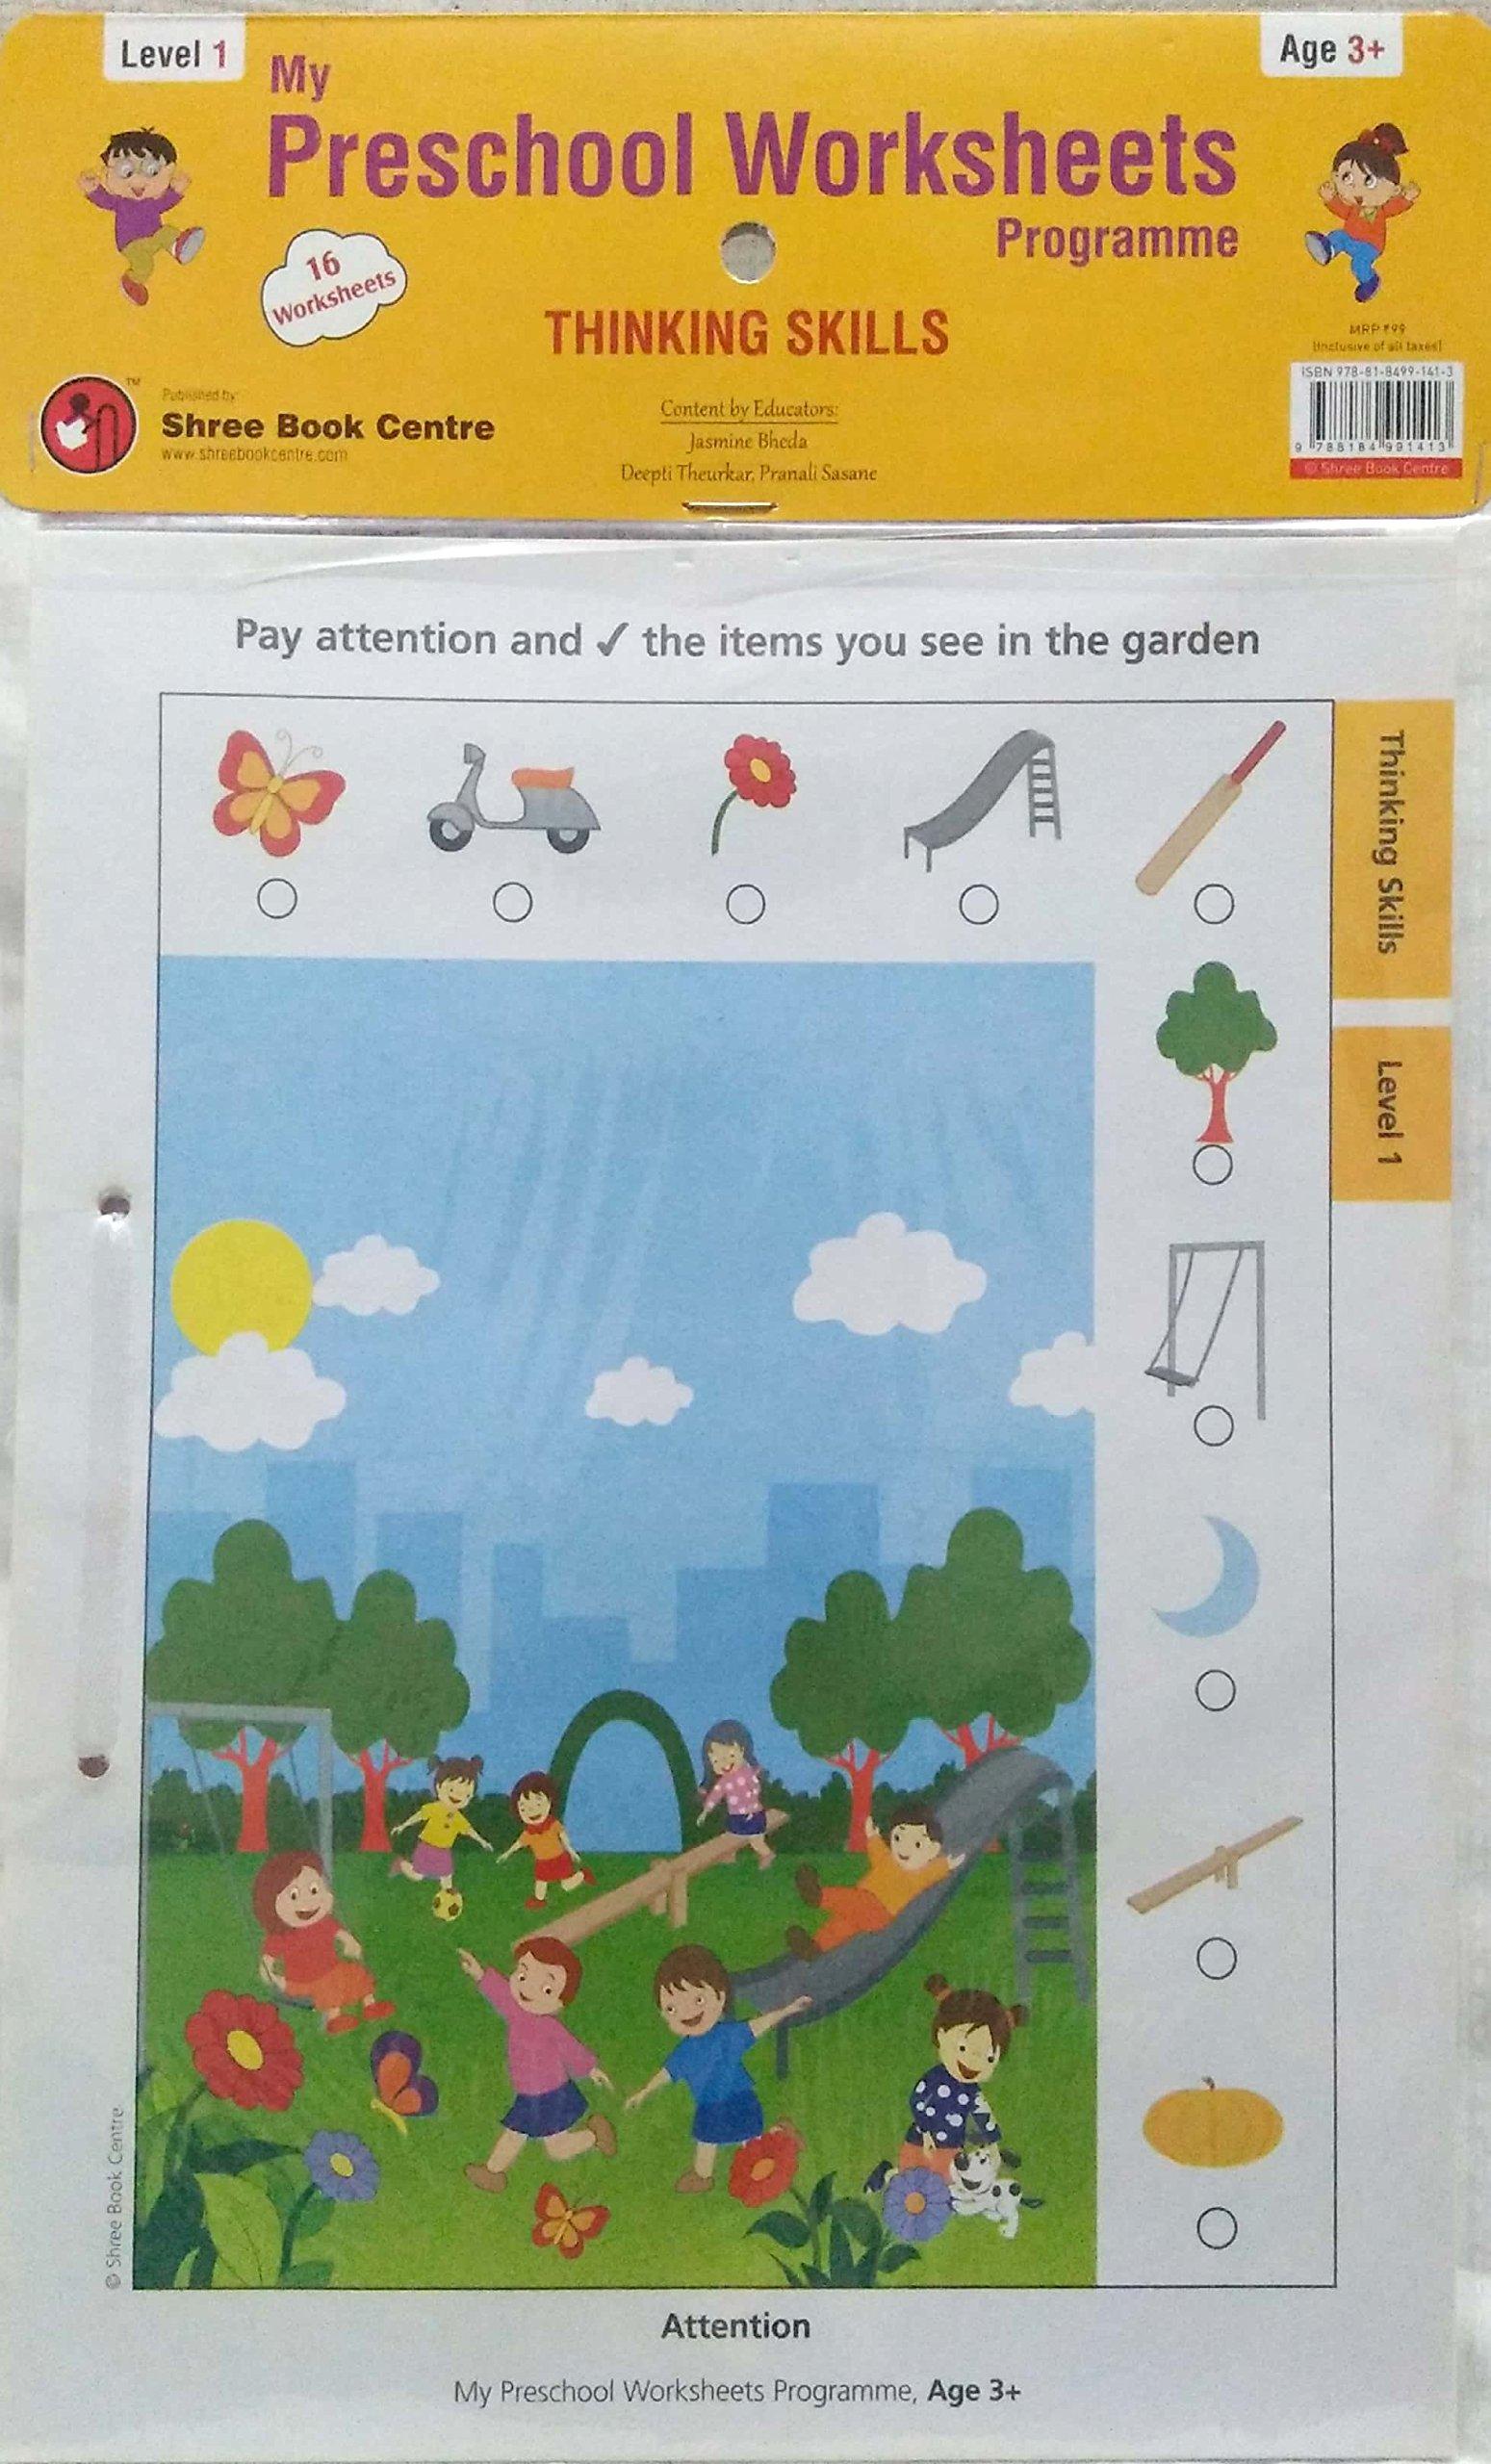 Buy My Preschool Worksheets Programme Thinking Skills Level 1 Book ...